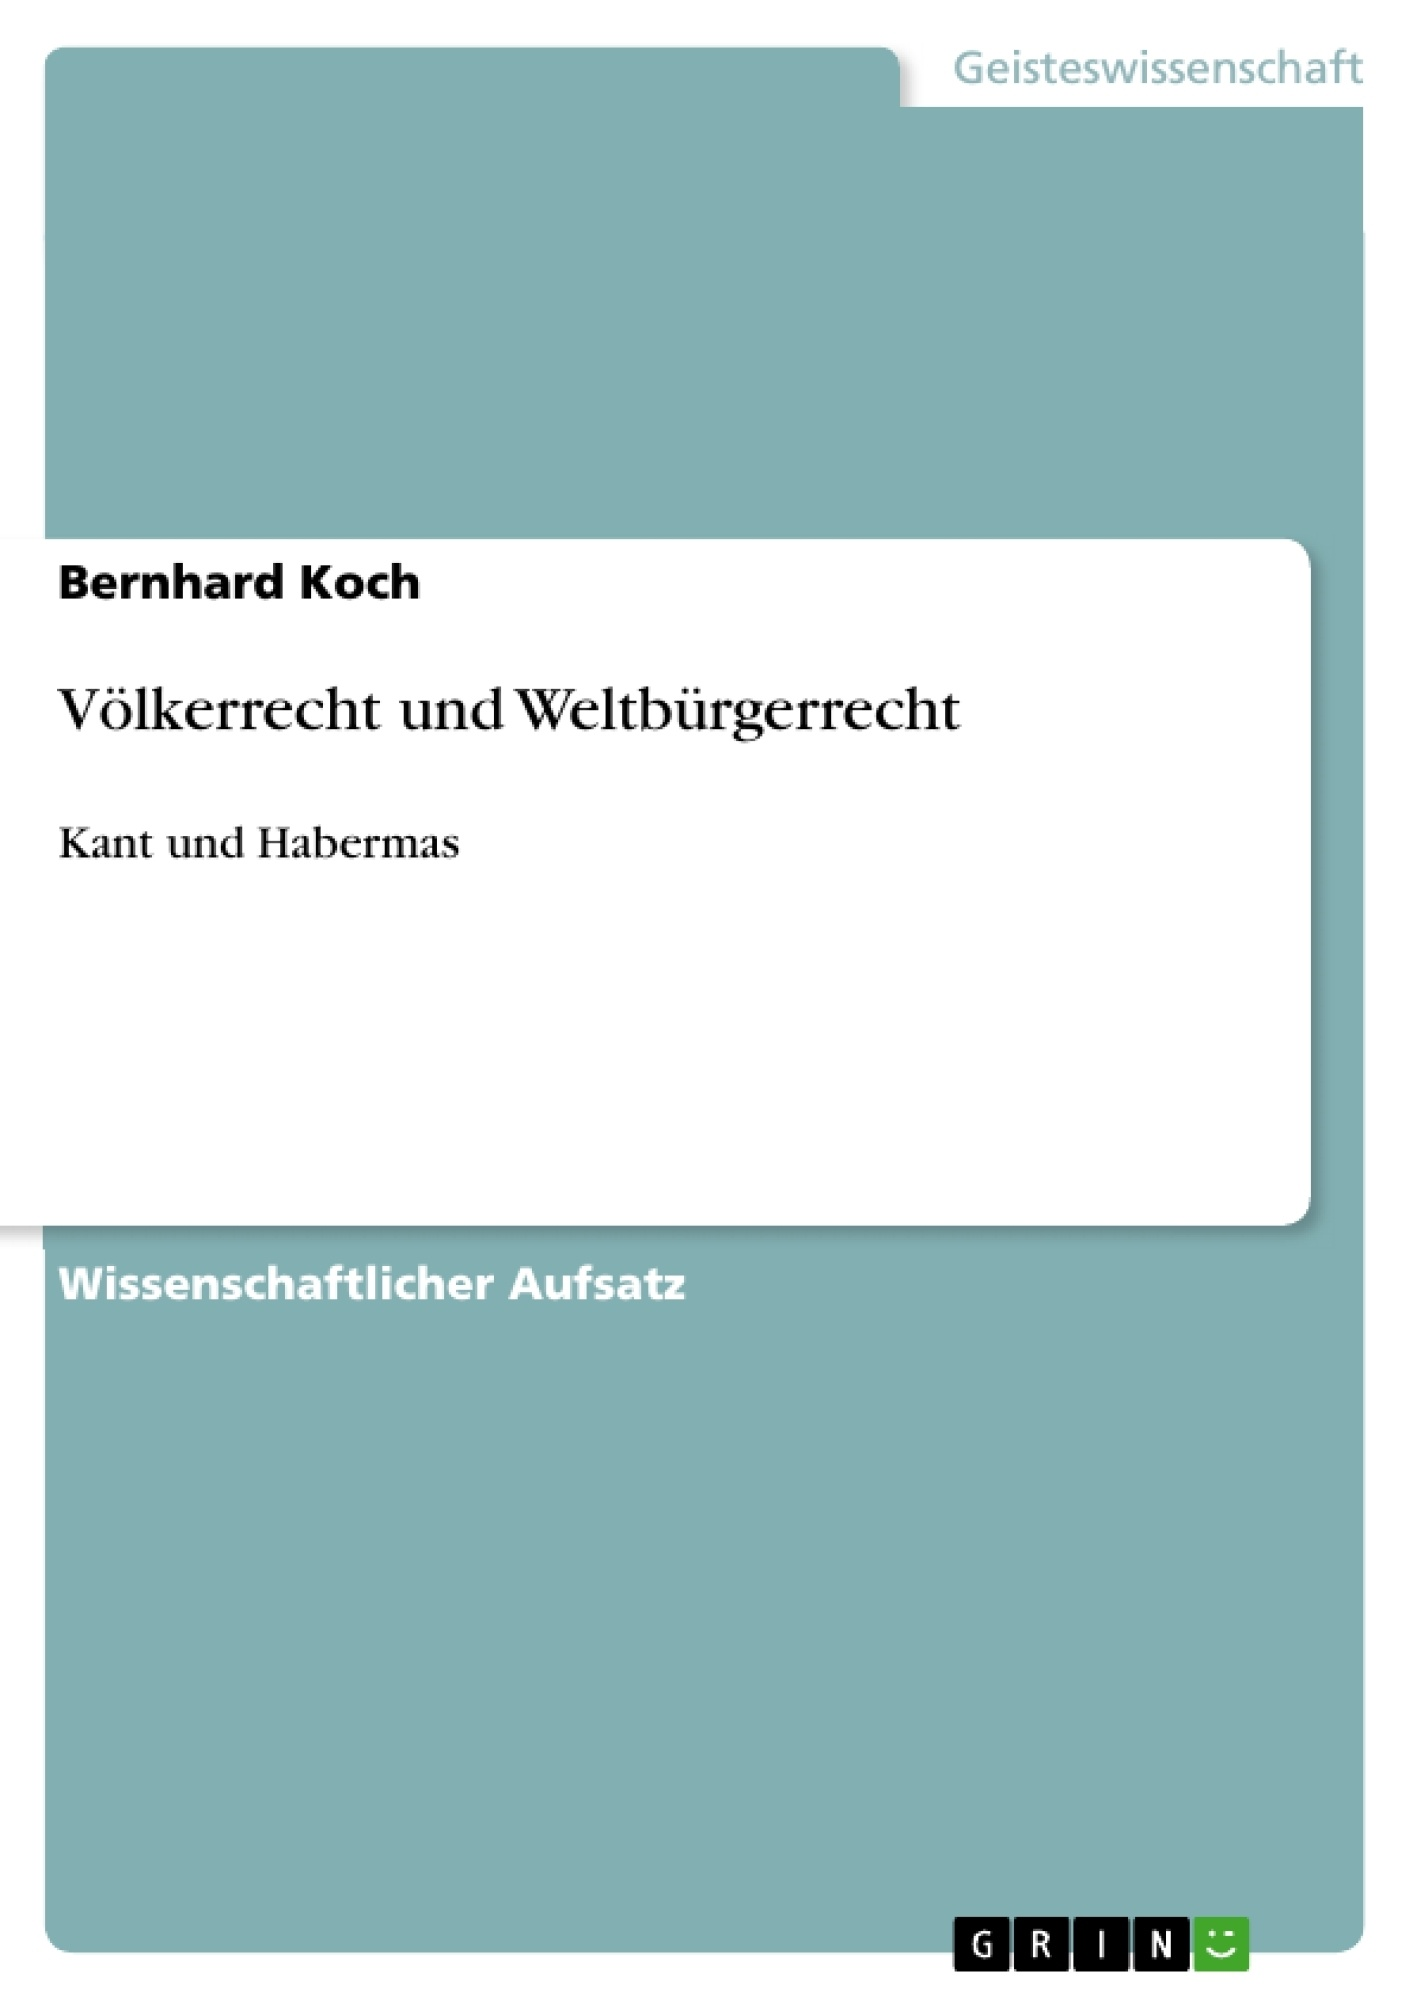 Titel: Völkerrecht und Weltbürgerrecht